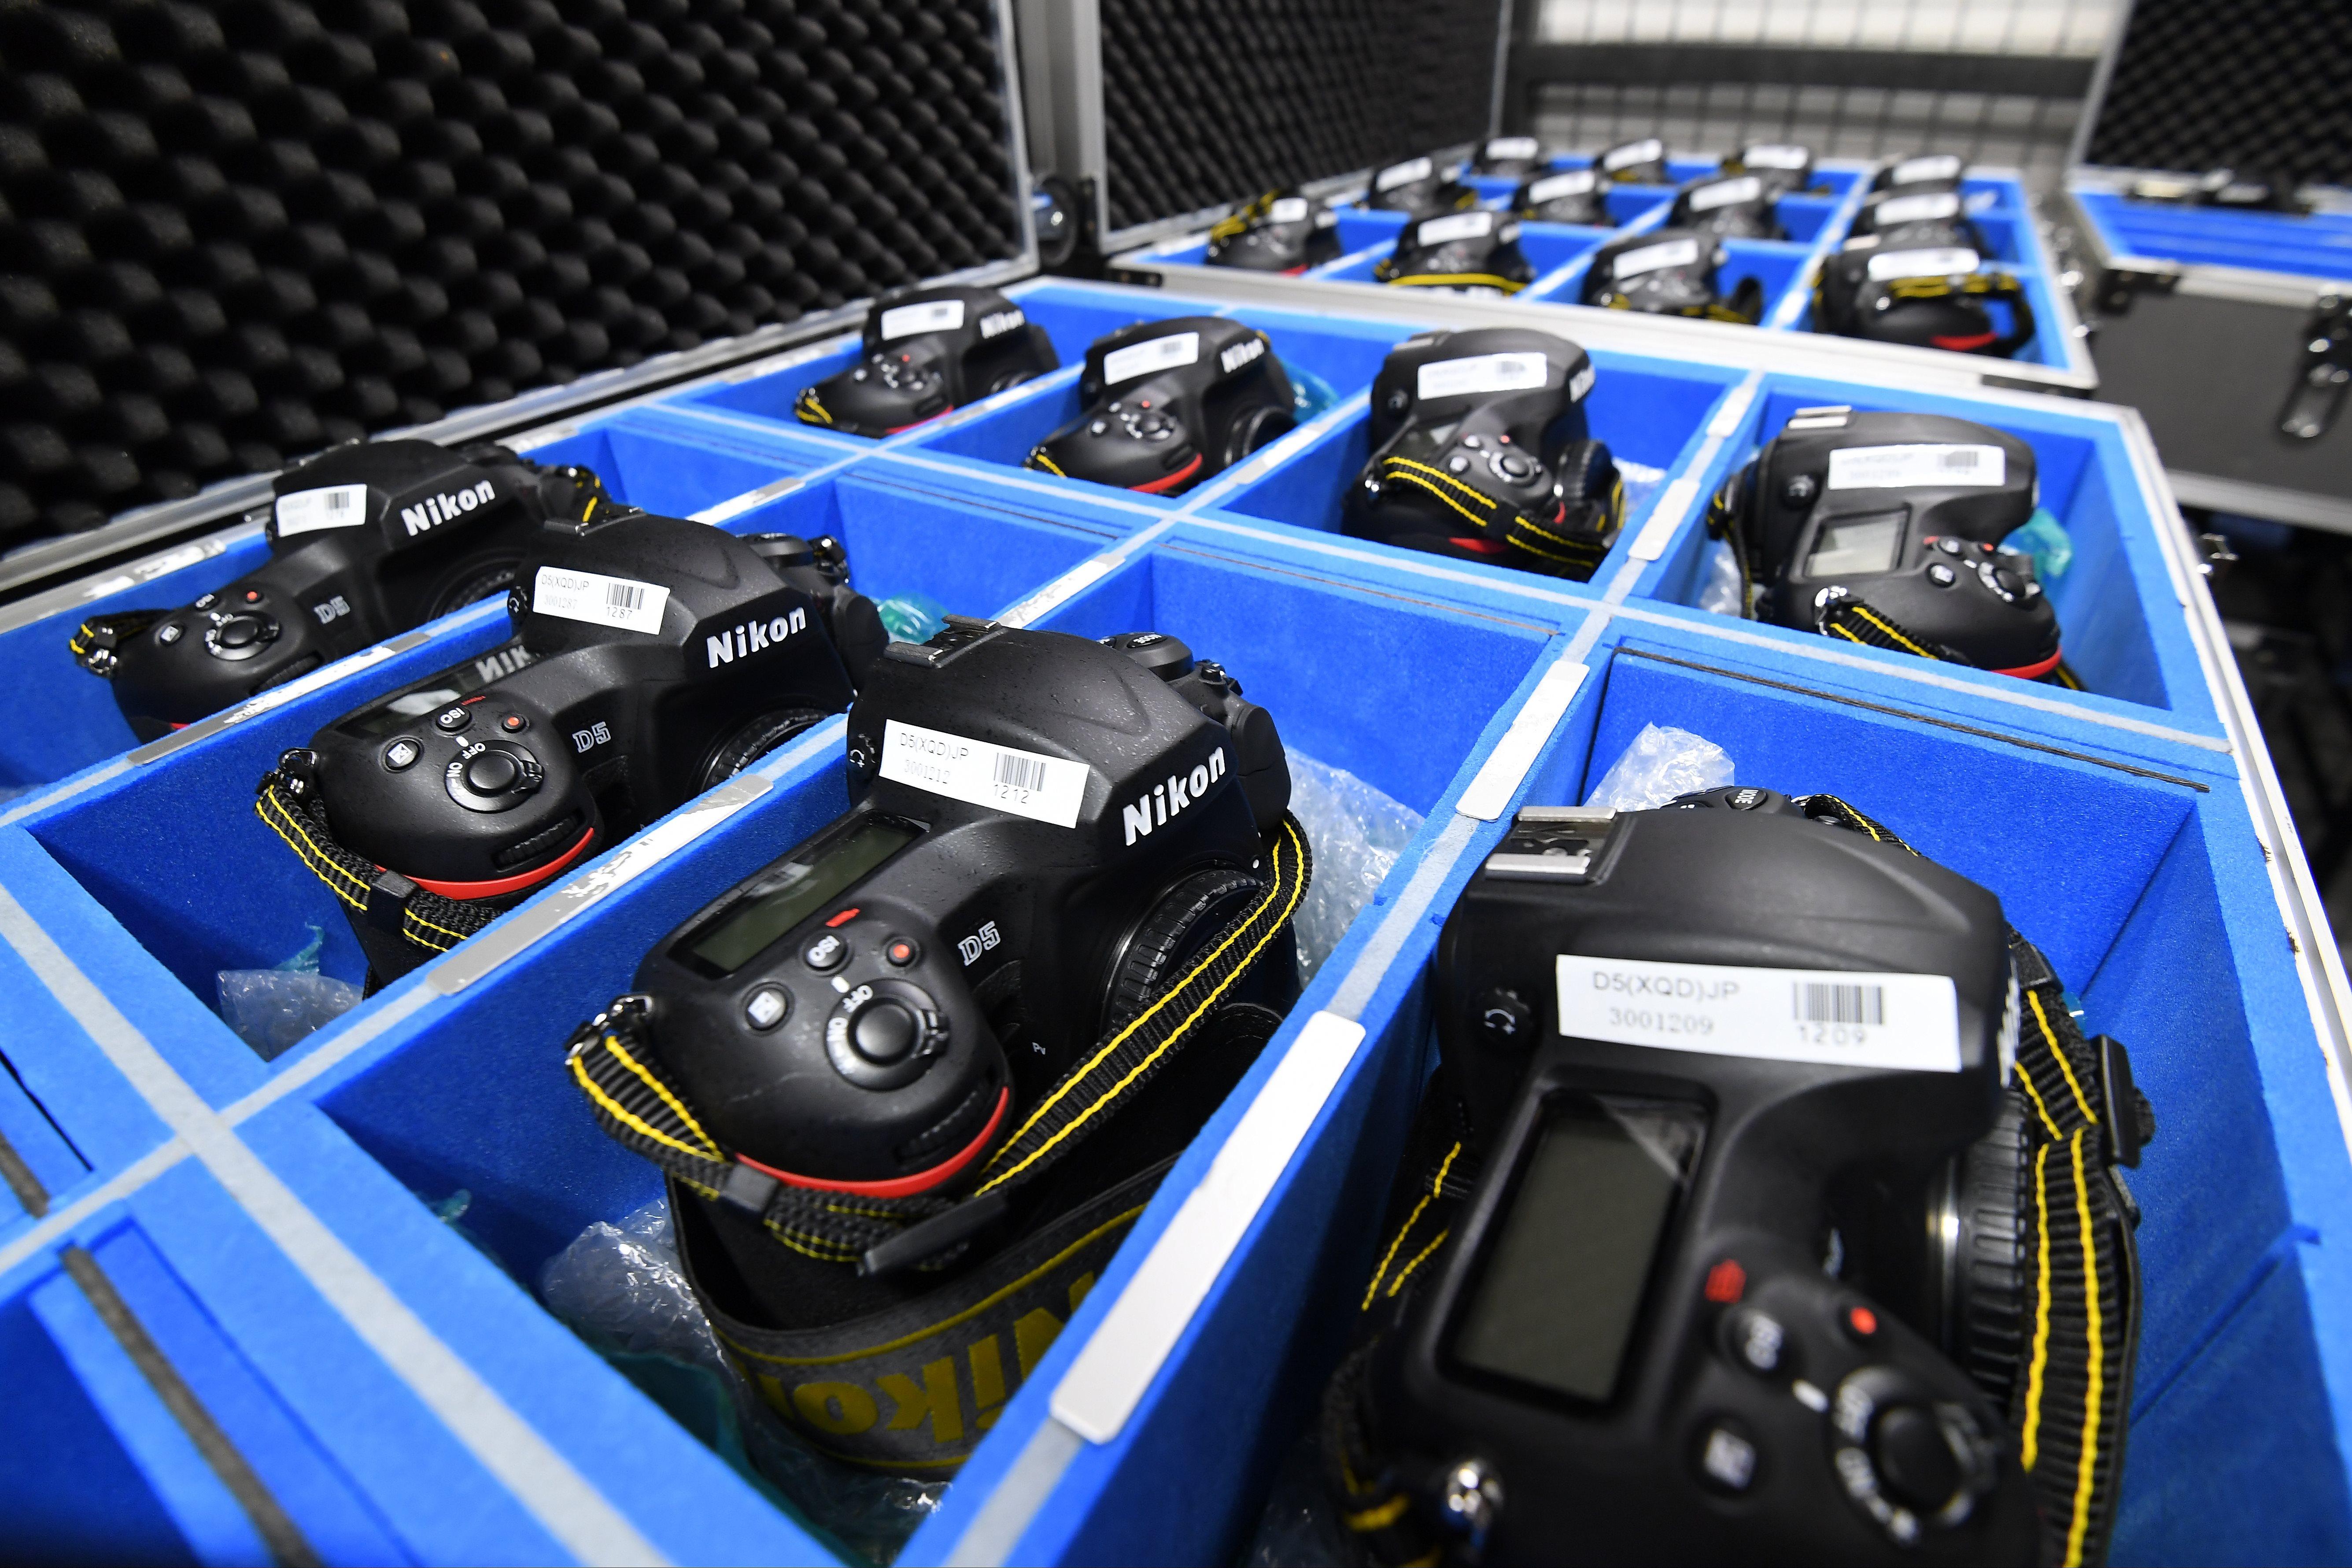 Boxes of Nikon cameras at the Rio Olympic games